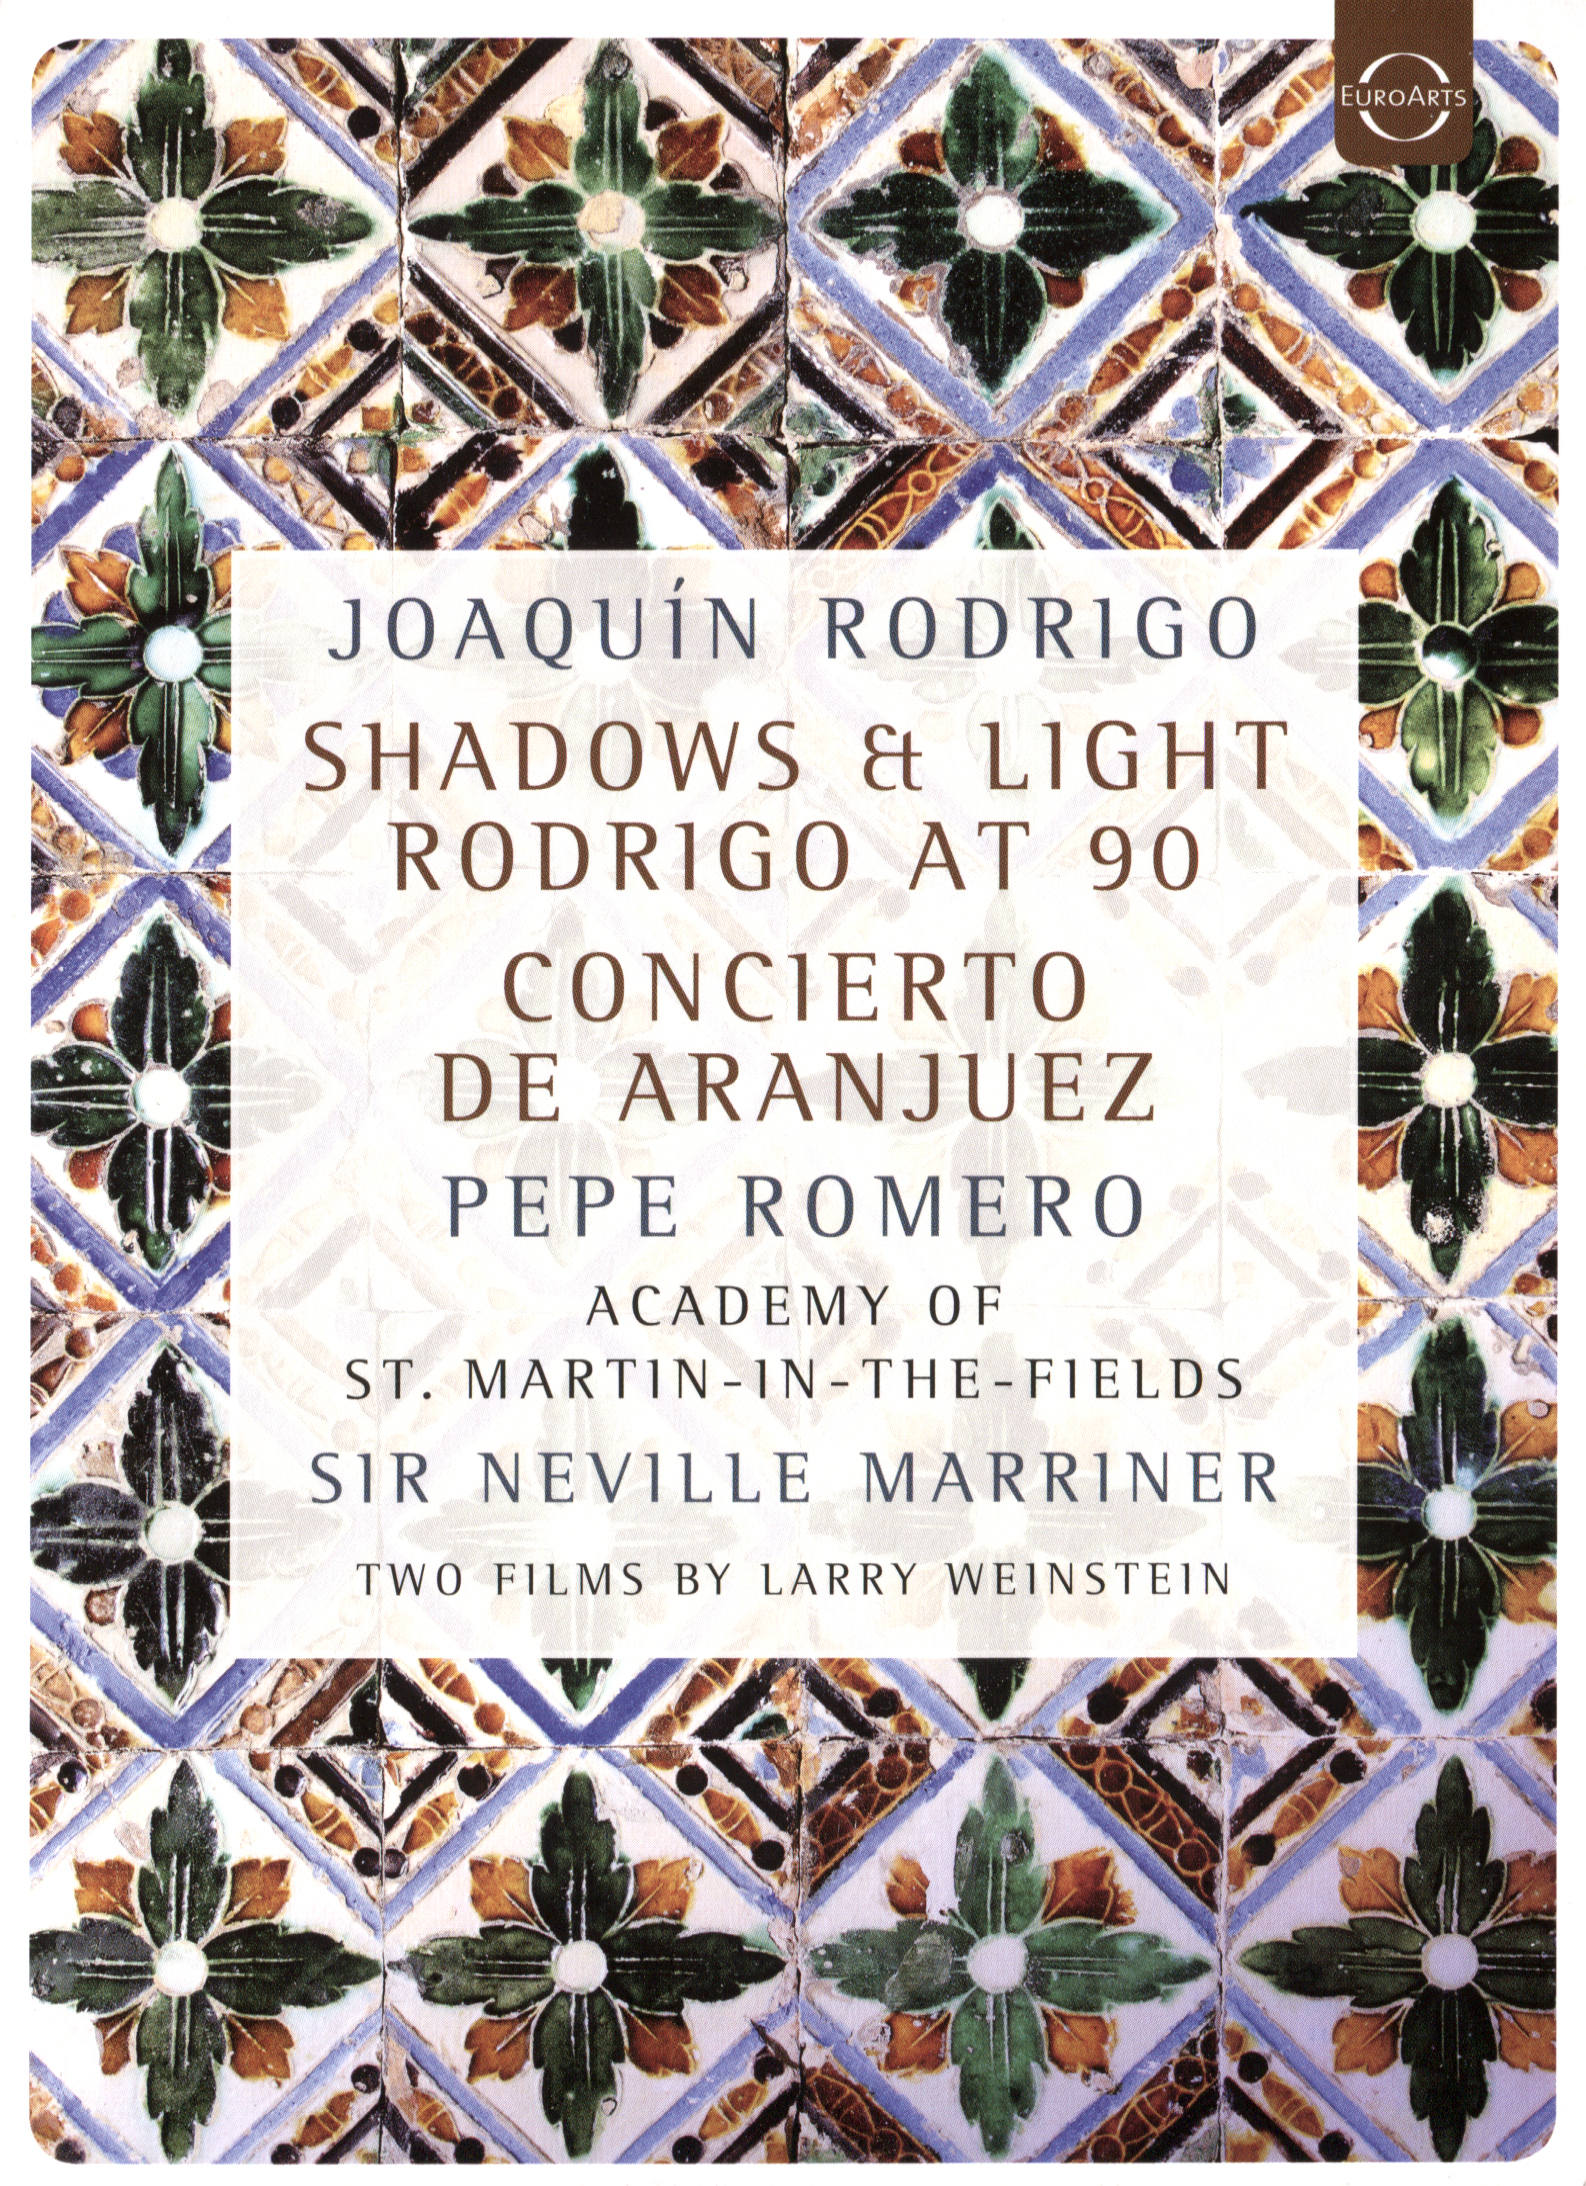 Joaquín Rodrigo: Shadows & Light - Rodrigo at 90 - Concierto De Aranjuez